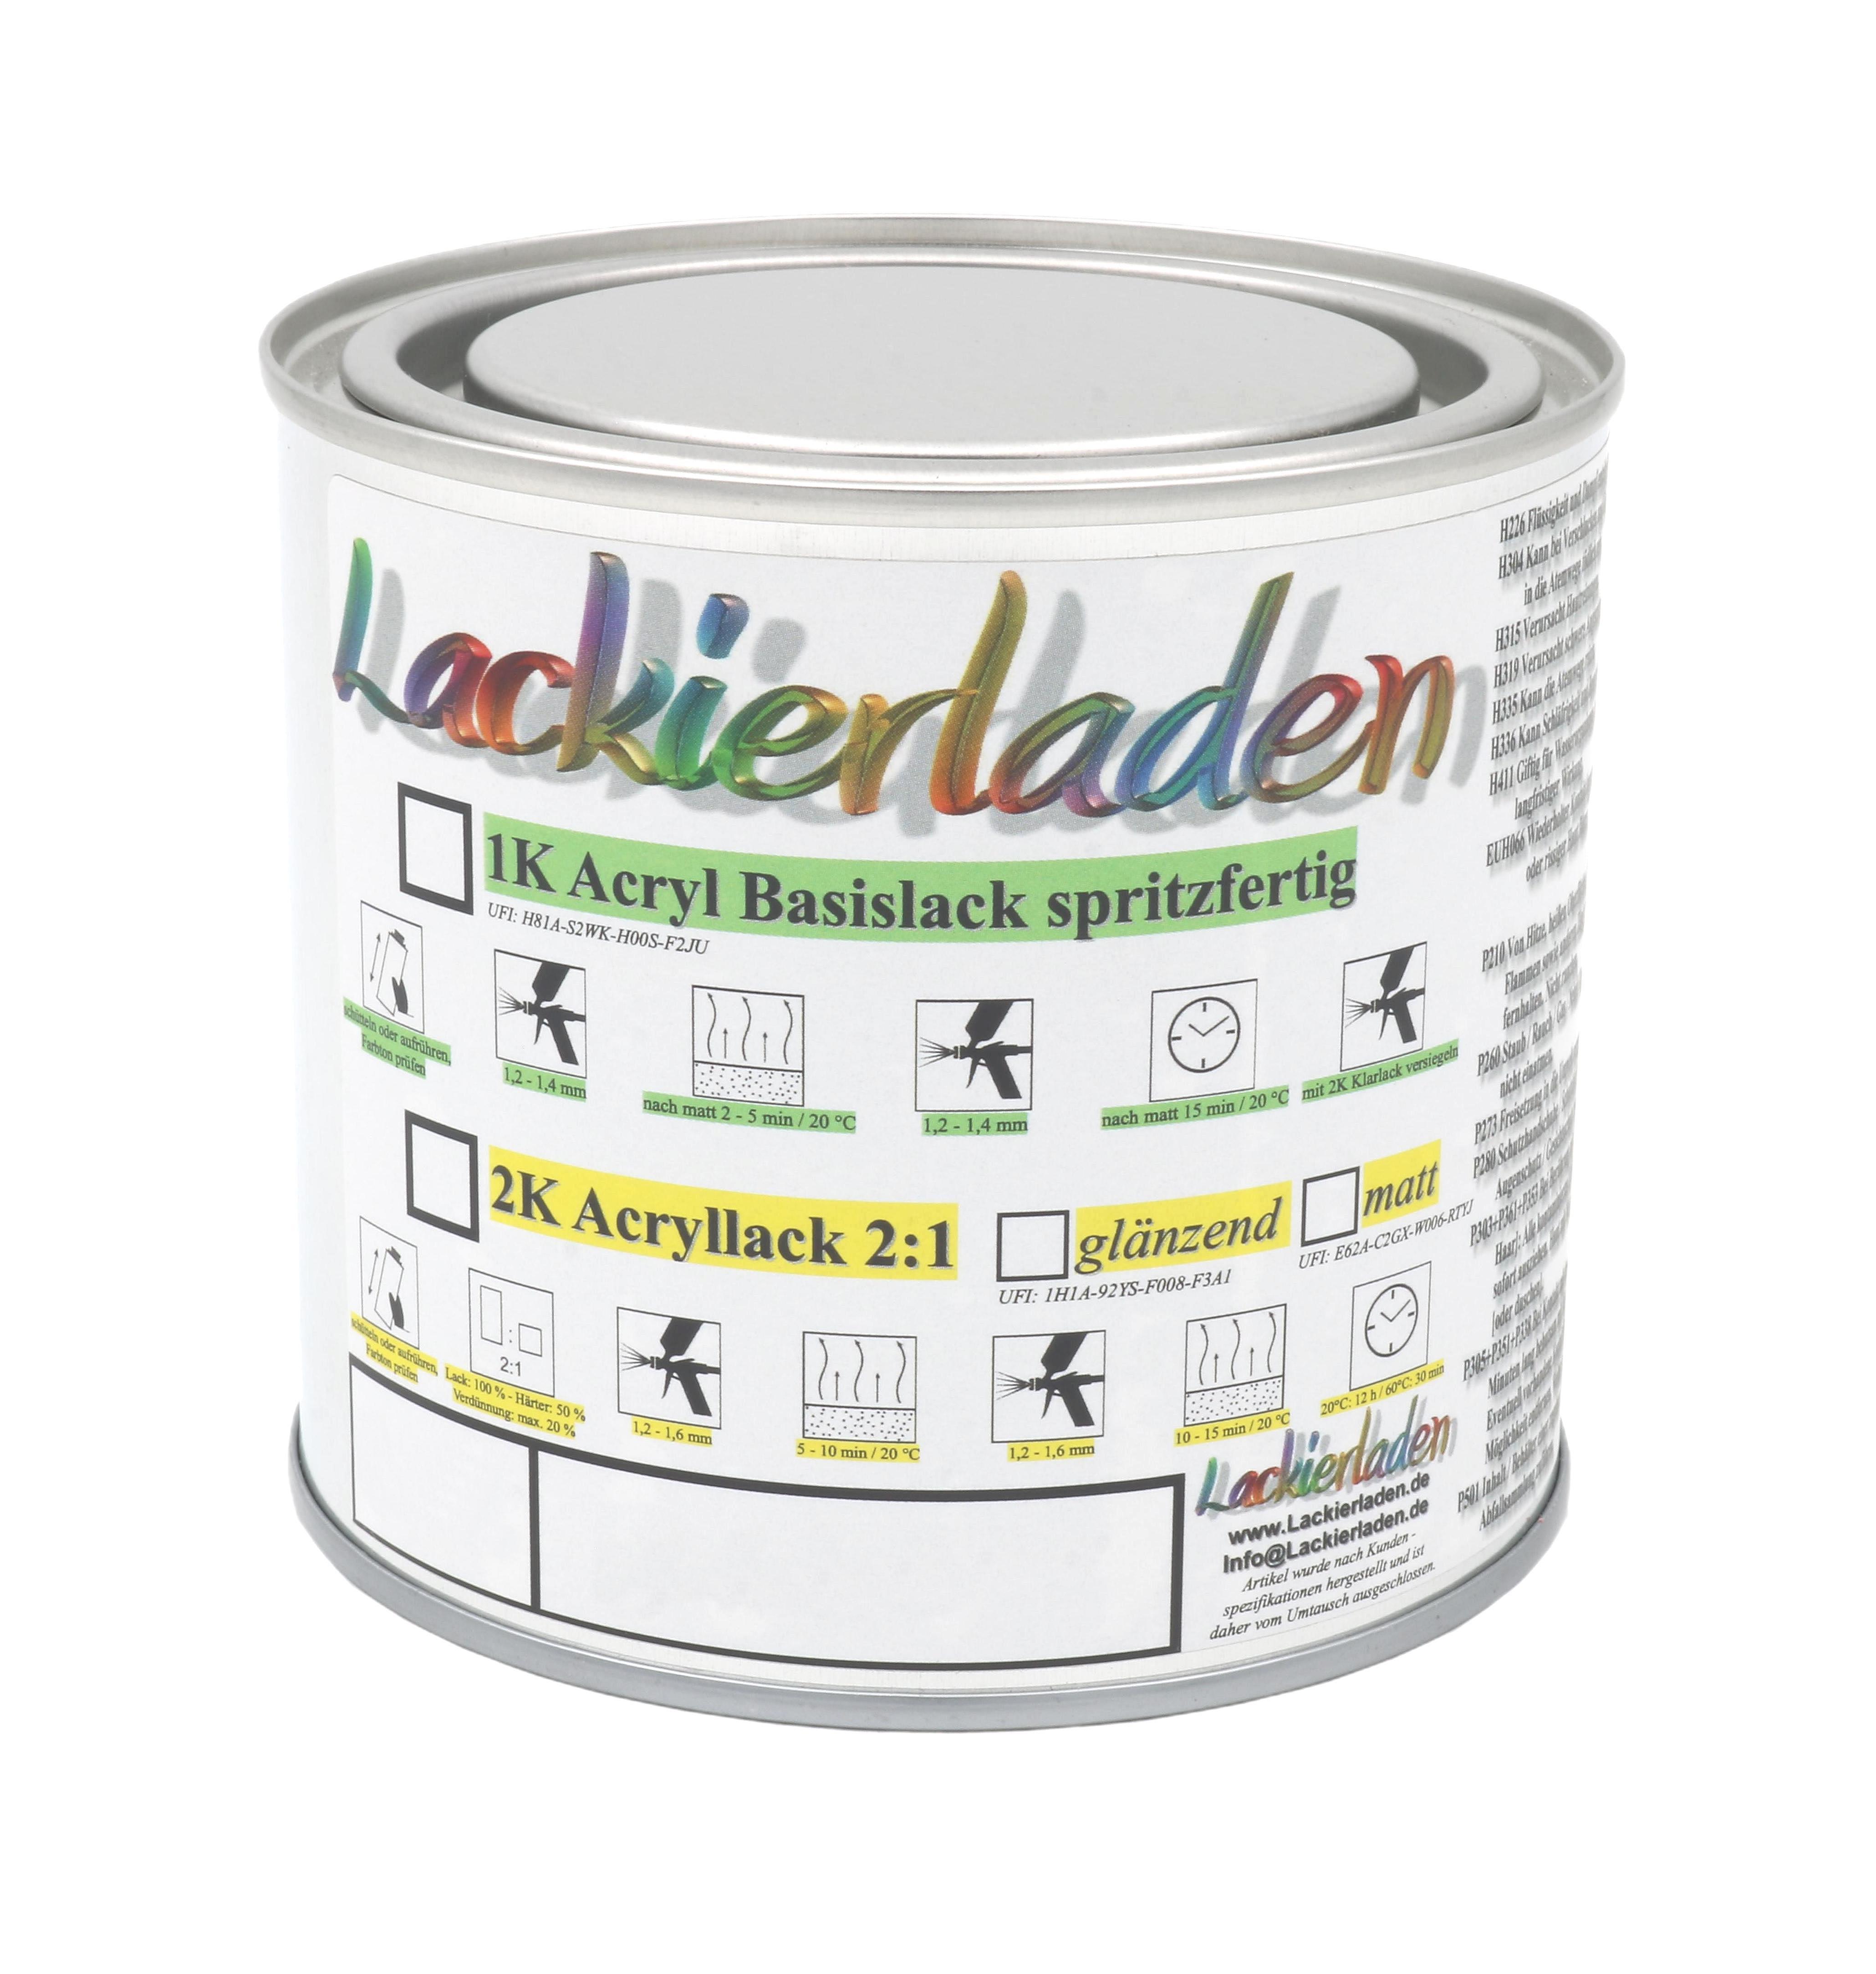 1K Acryl Basis 0,25 Liter spritzfertig Autolack